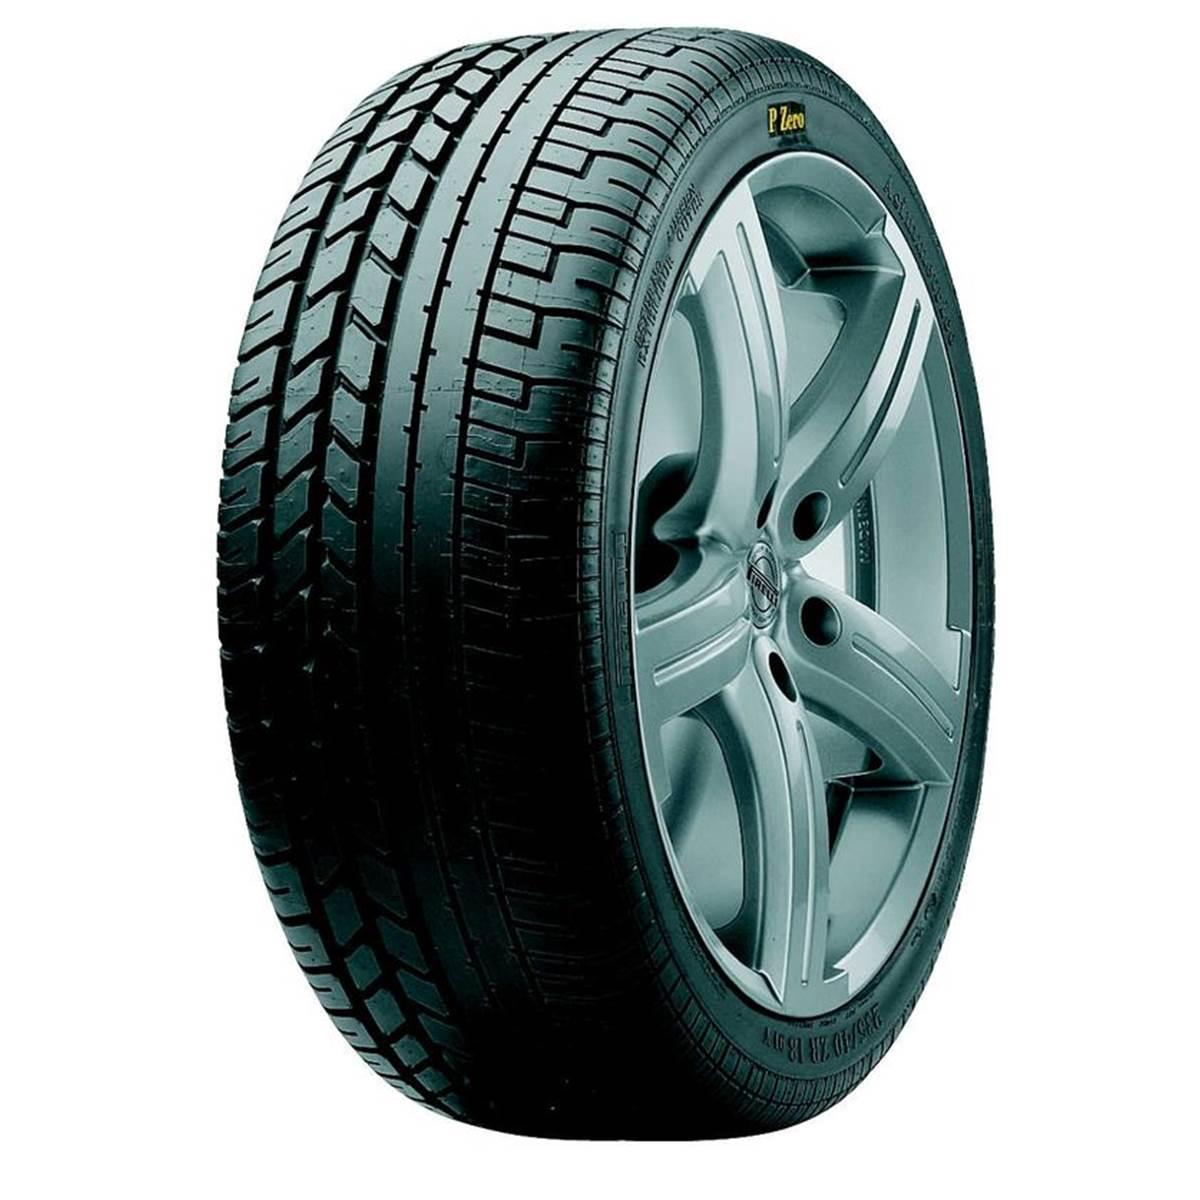 Pneu Pirelli 235/50R17 96W Pzero Asimmetrico